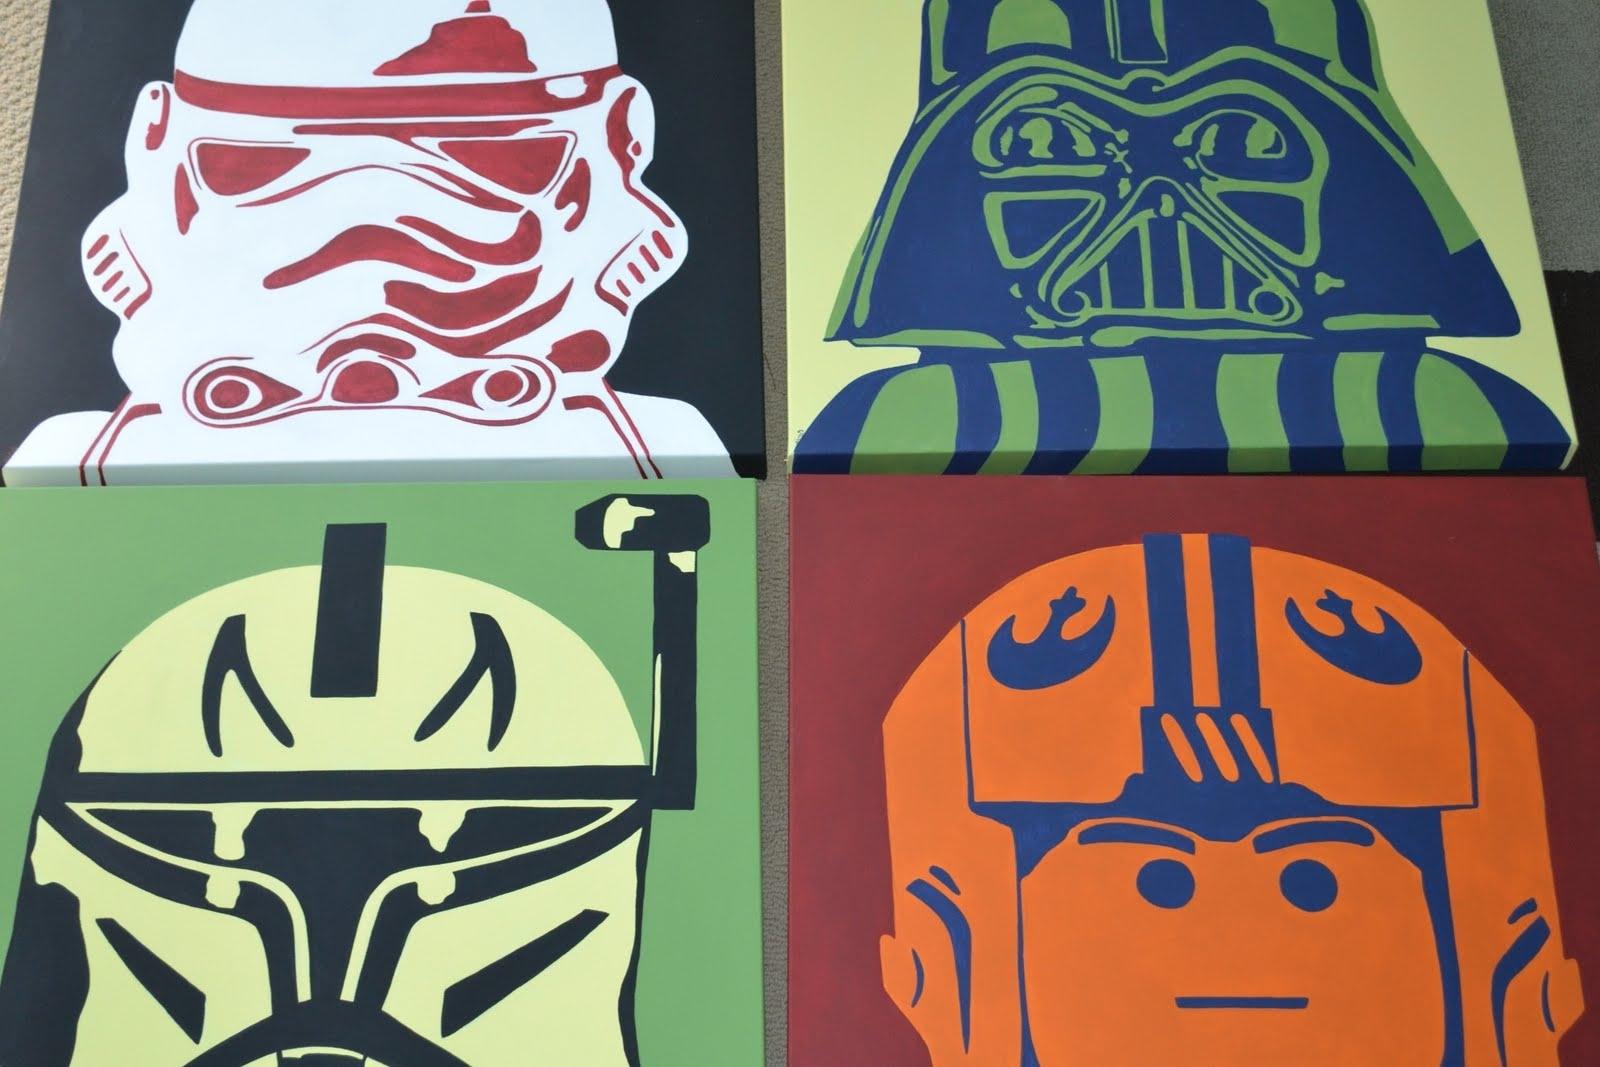 Fashionable Lego Star Wars Wall Art Throughout You're Artcorie Kline: Star Wars Legos Pop Art (View 3 of 15)